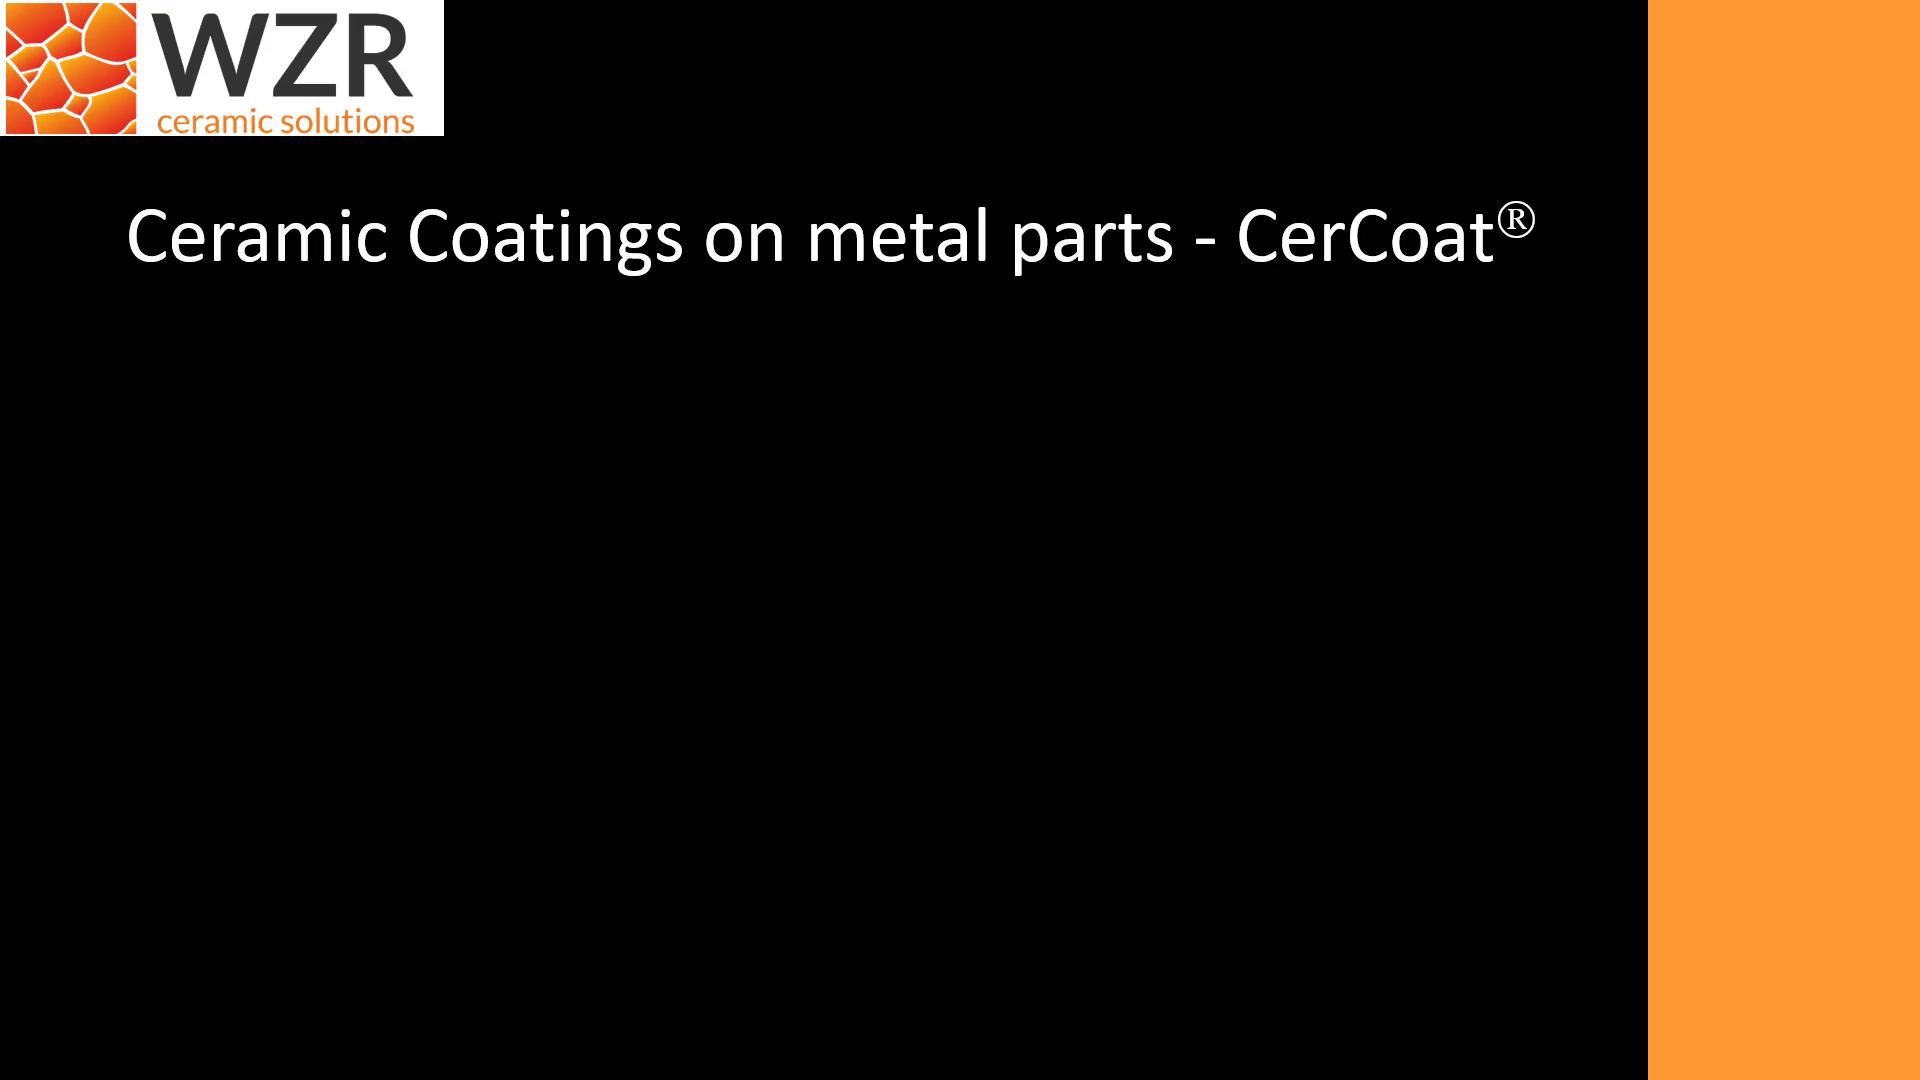 Ceramic Coatings on metal parts - CerCoat®